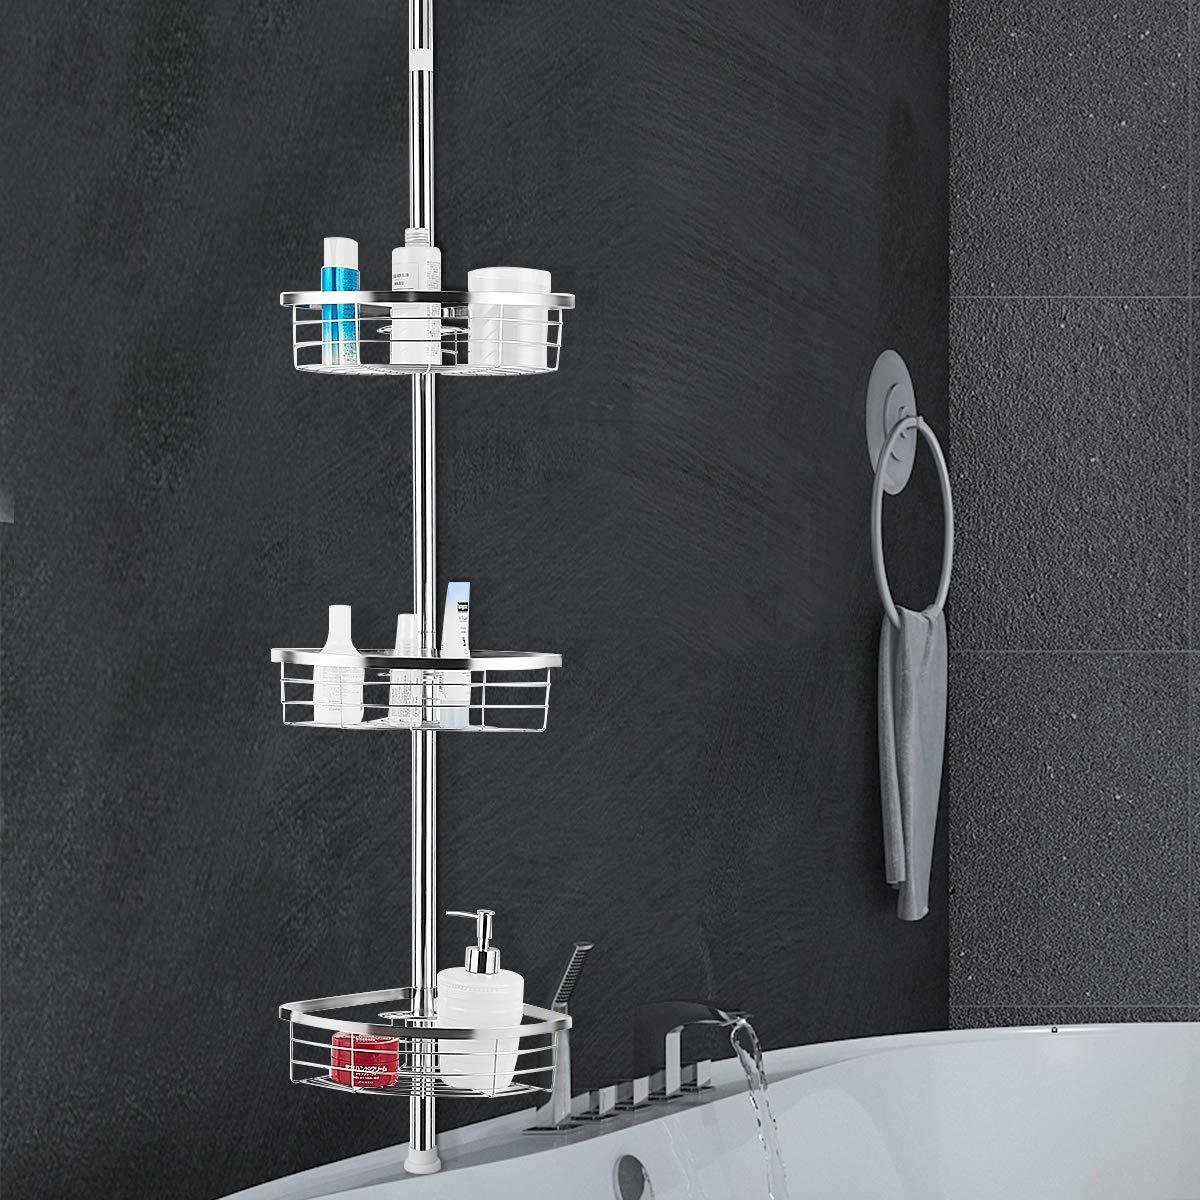 Tangkula Corner Shower Caddy Stainless Steel Bathroom Rack 3-Tier Adjustable Storage Corner Shelf Units Accessory Rack Holder Bathroom Storage Shelves for Shampoo, Conditioner, Soap